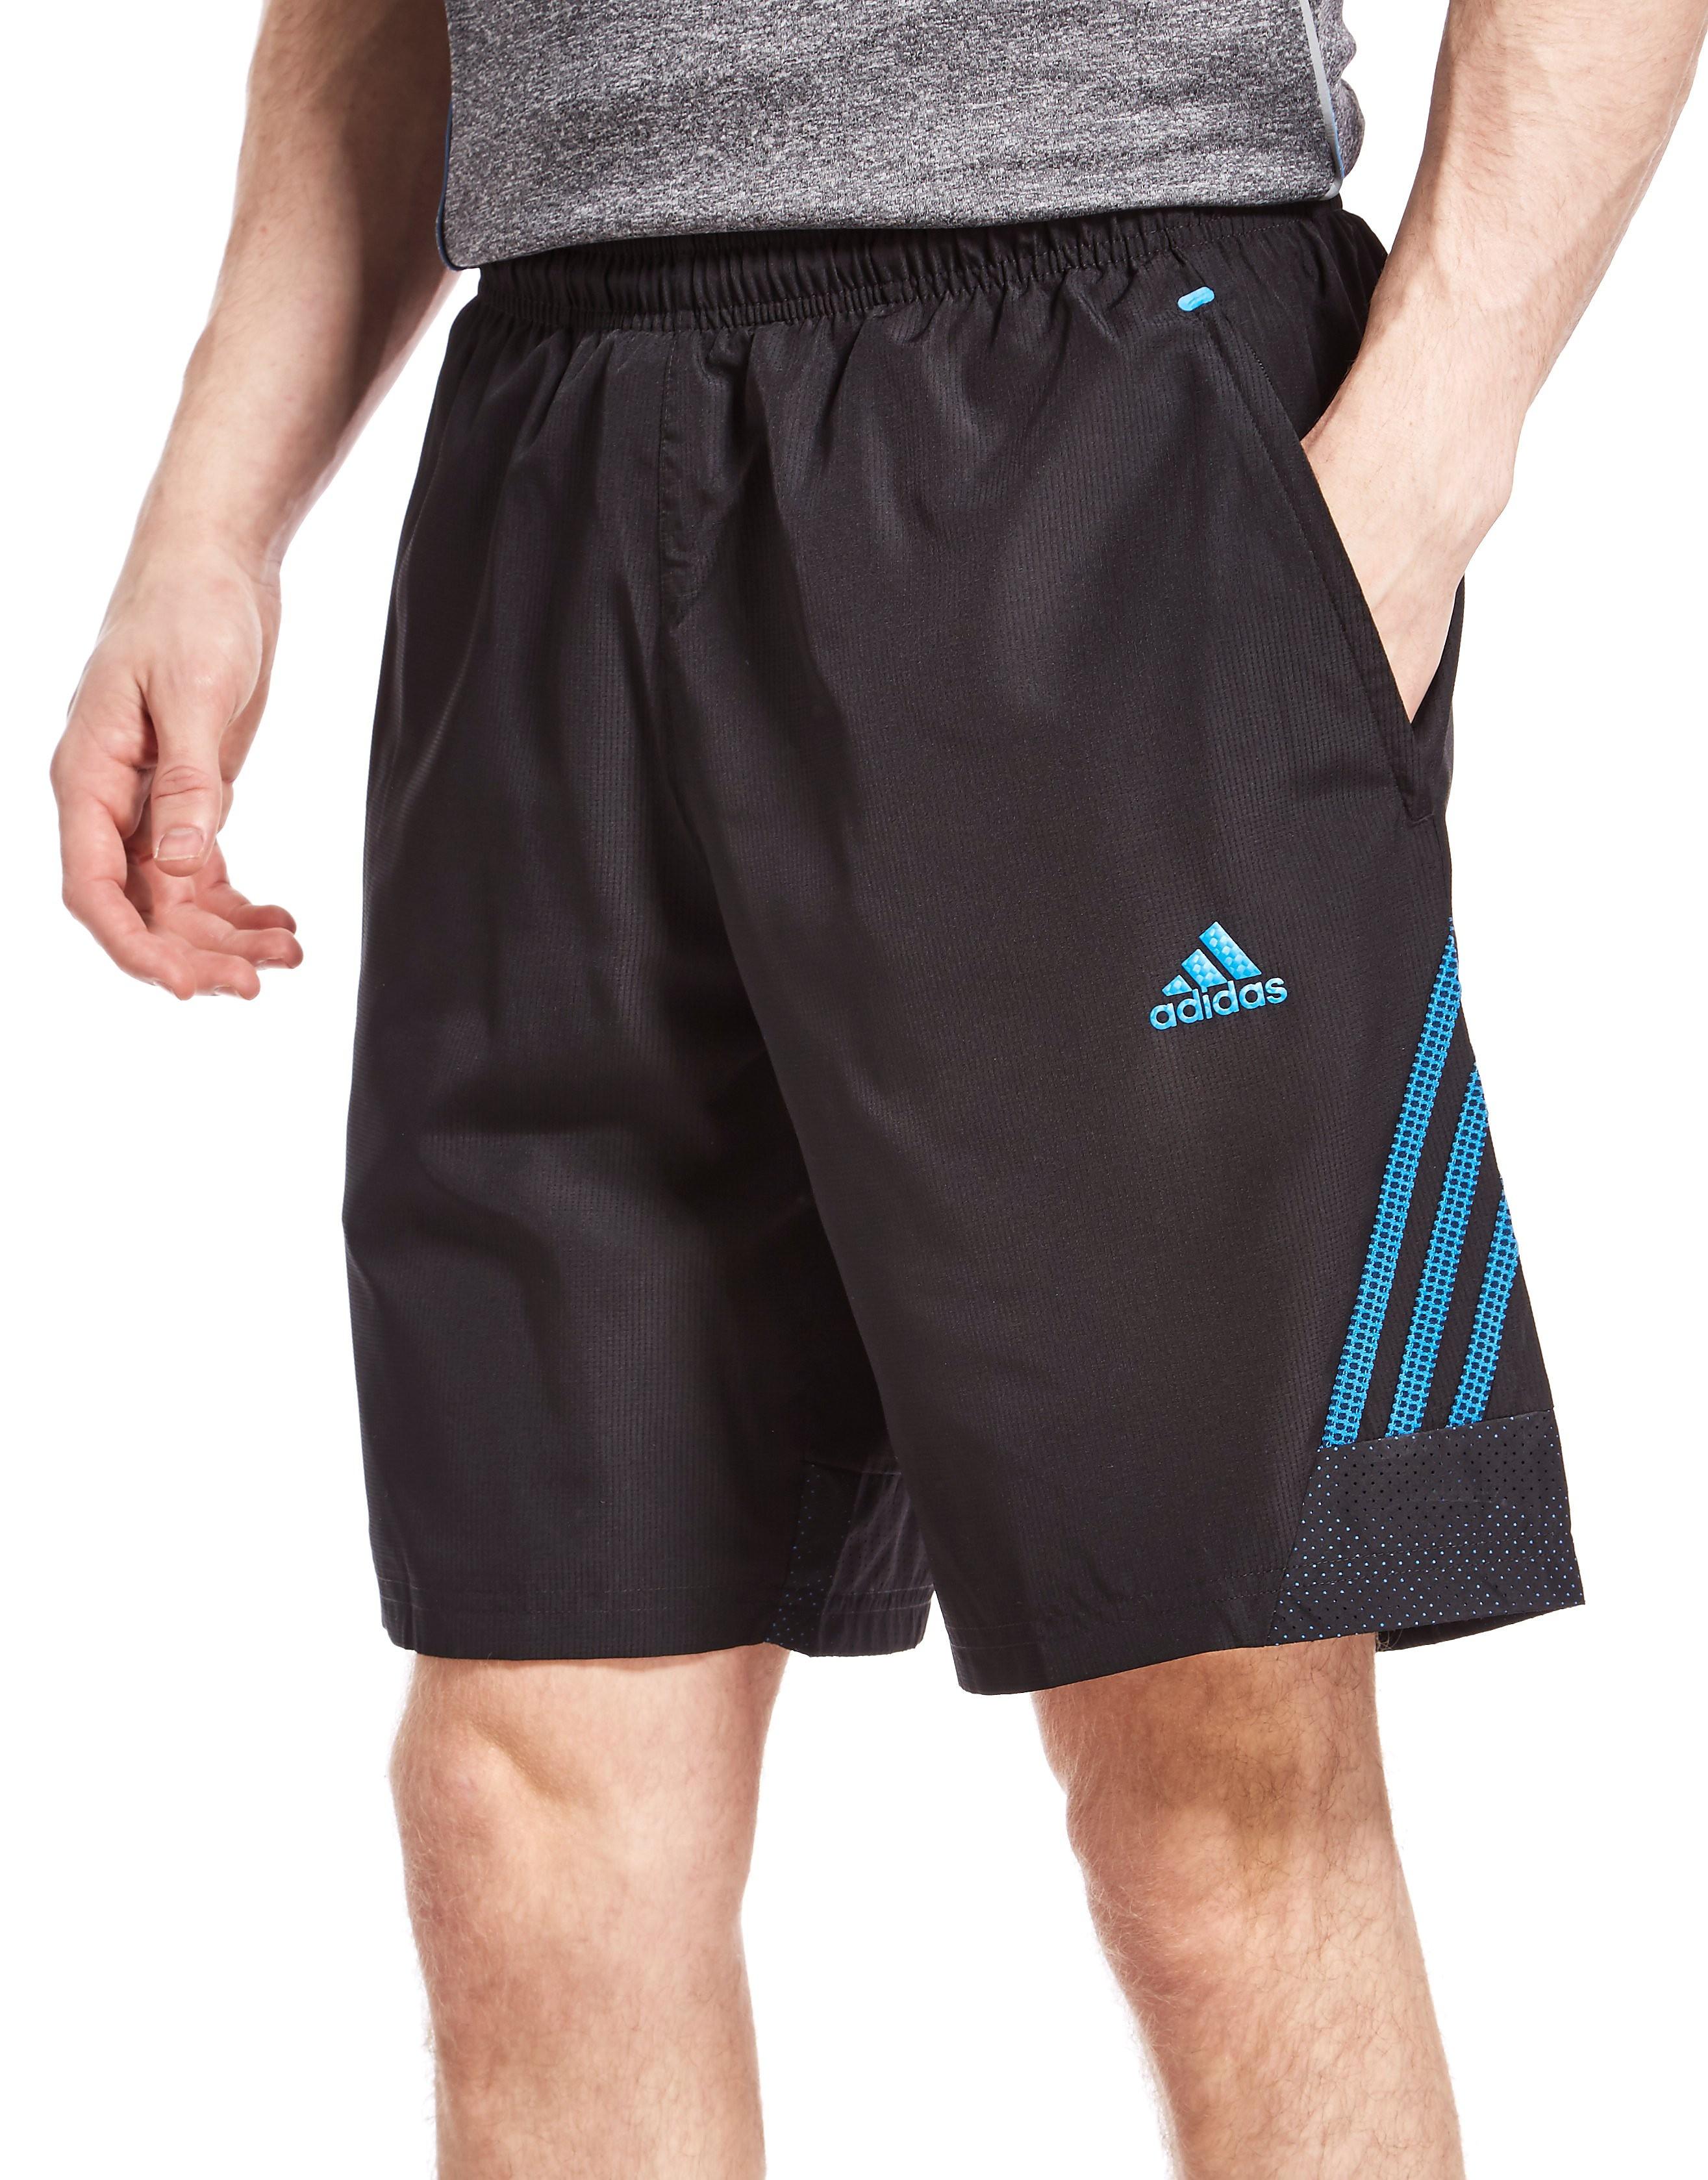 adidas Blaze Shorts